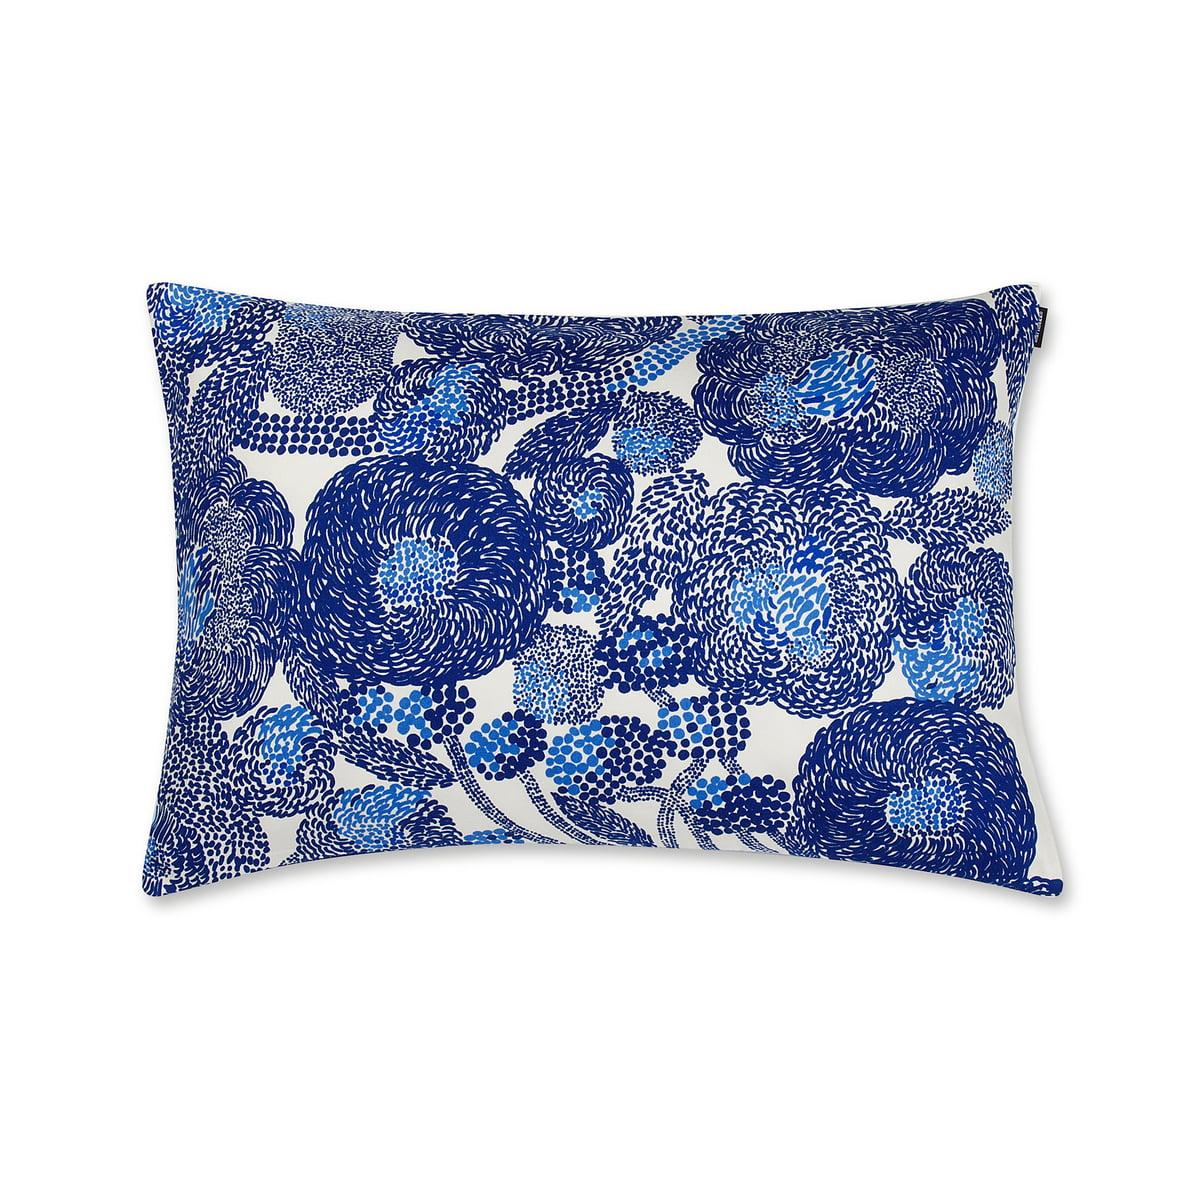 mynsteri cushion cover 40 x 60 cm by marimekko connox. Black Bedroom Furniture Sets. Home Design Ideas